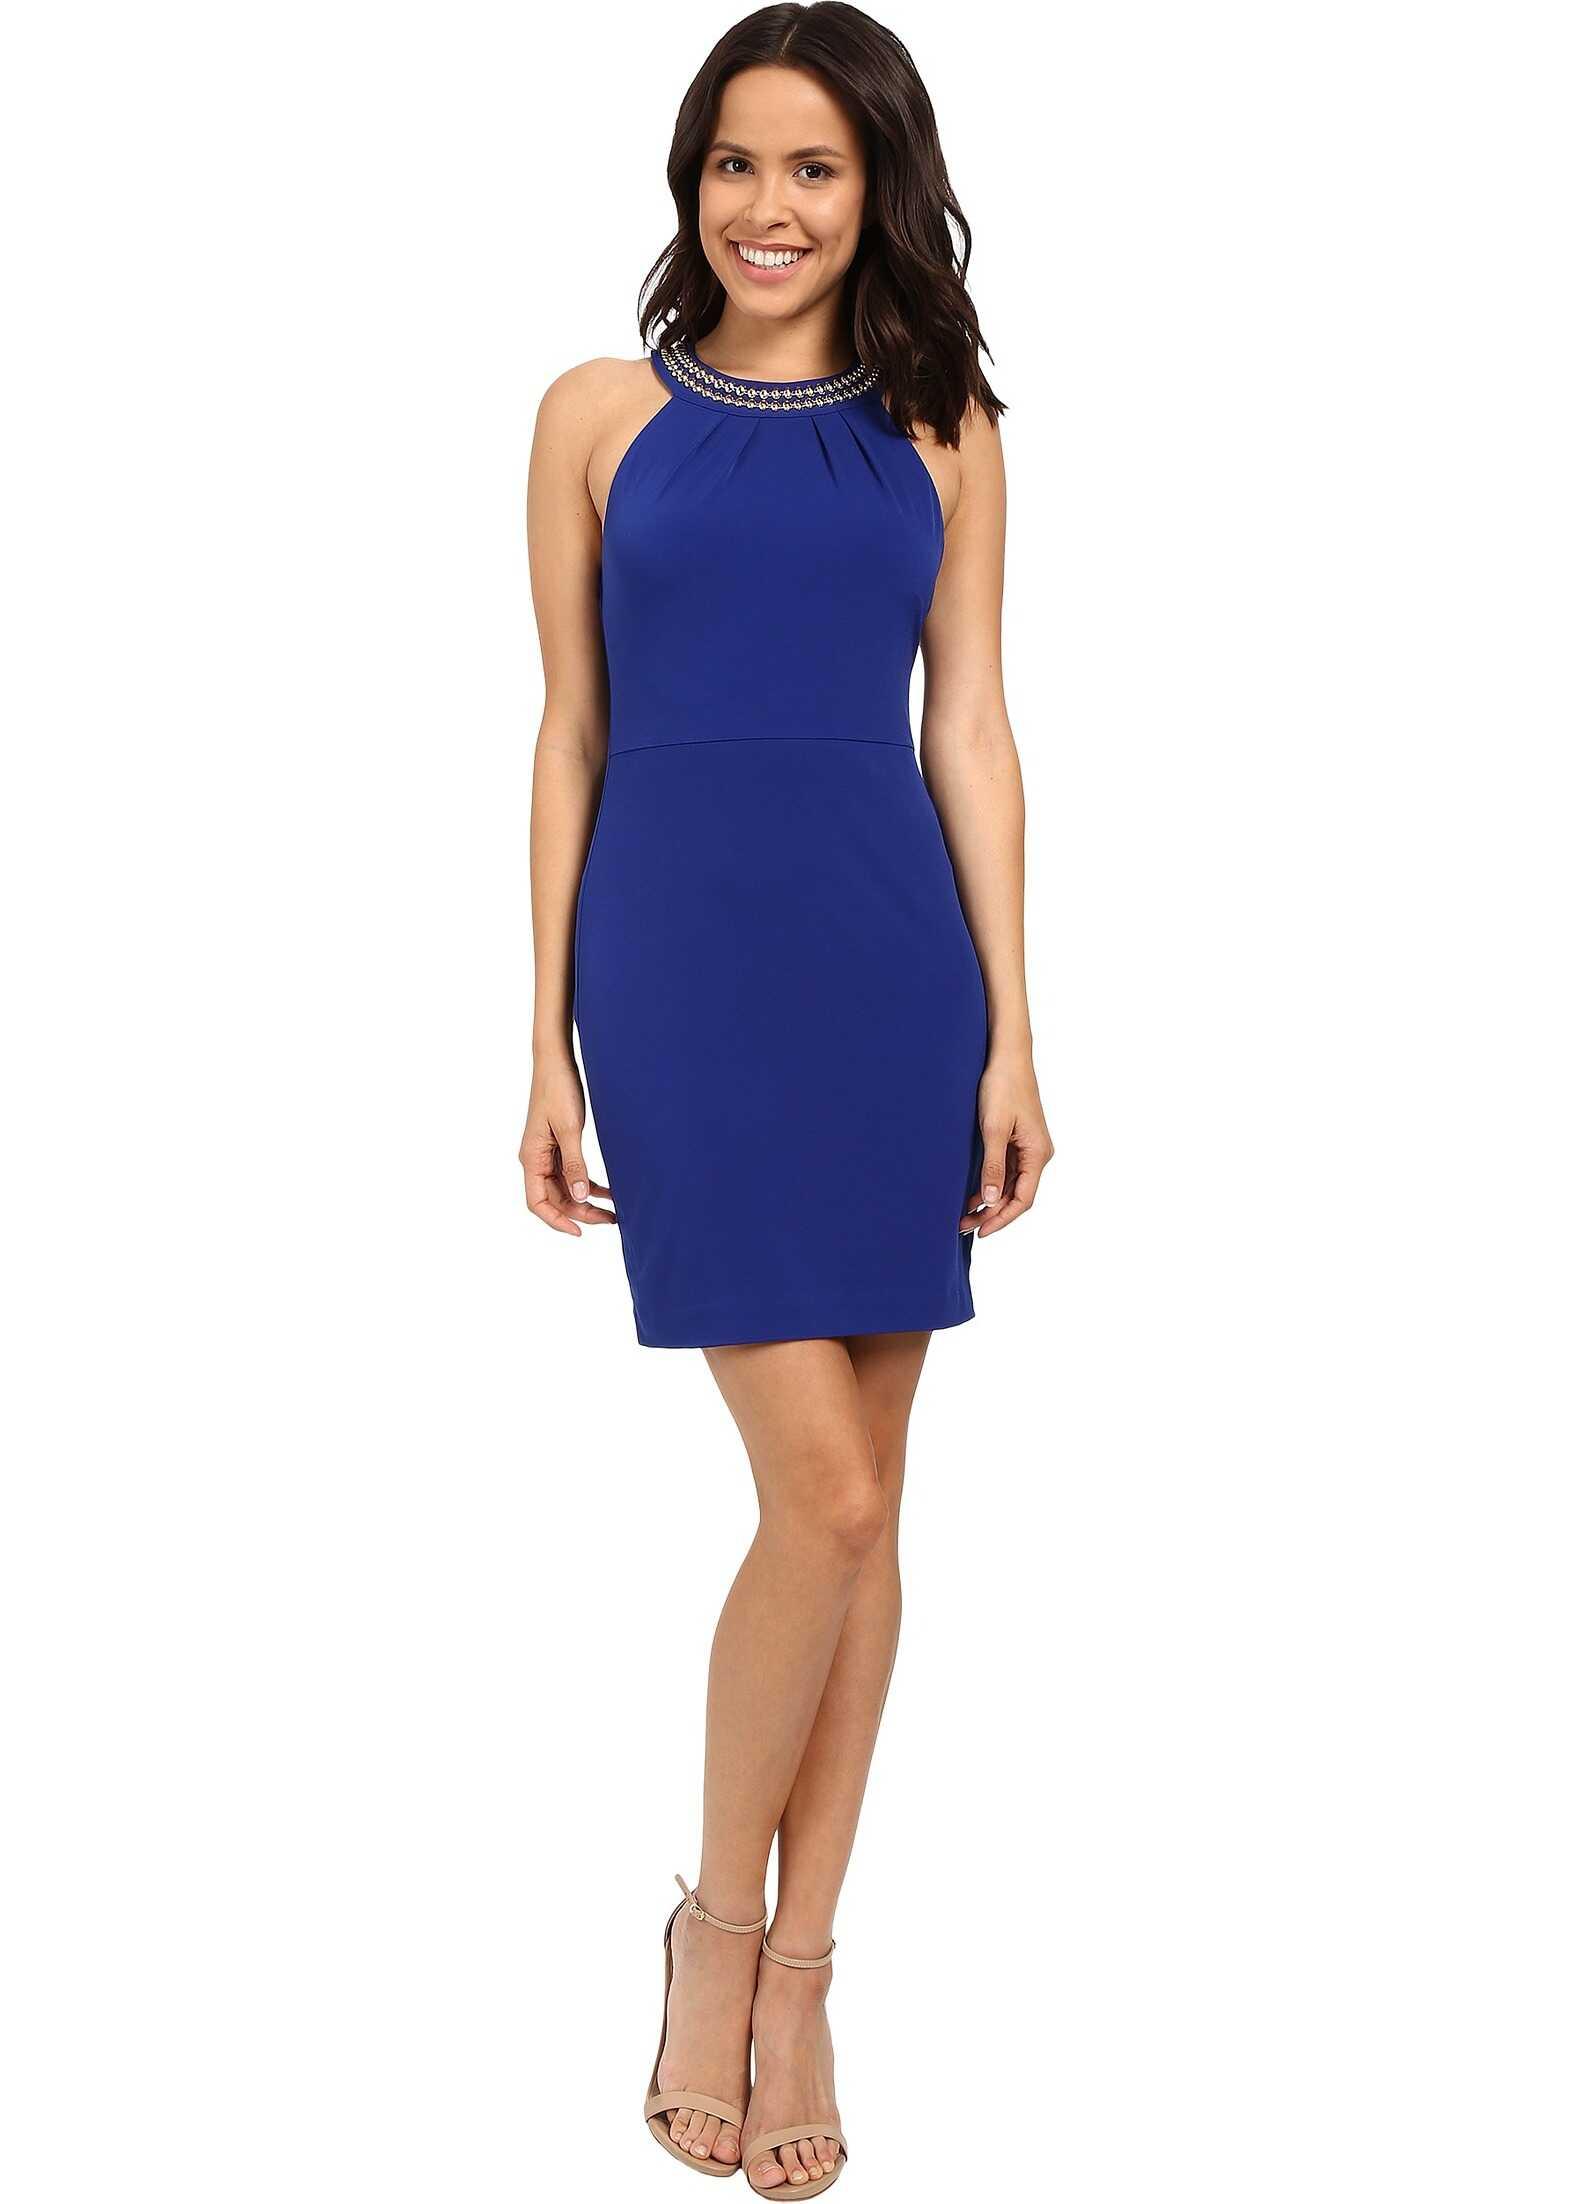 Jessica Simpson Solid Dress with Neck Embellishment JS6D8653 Cobalt